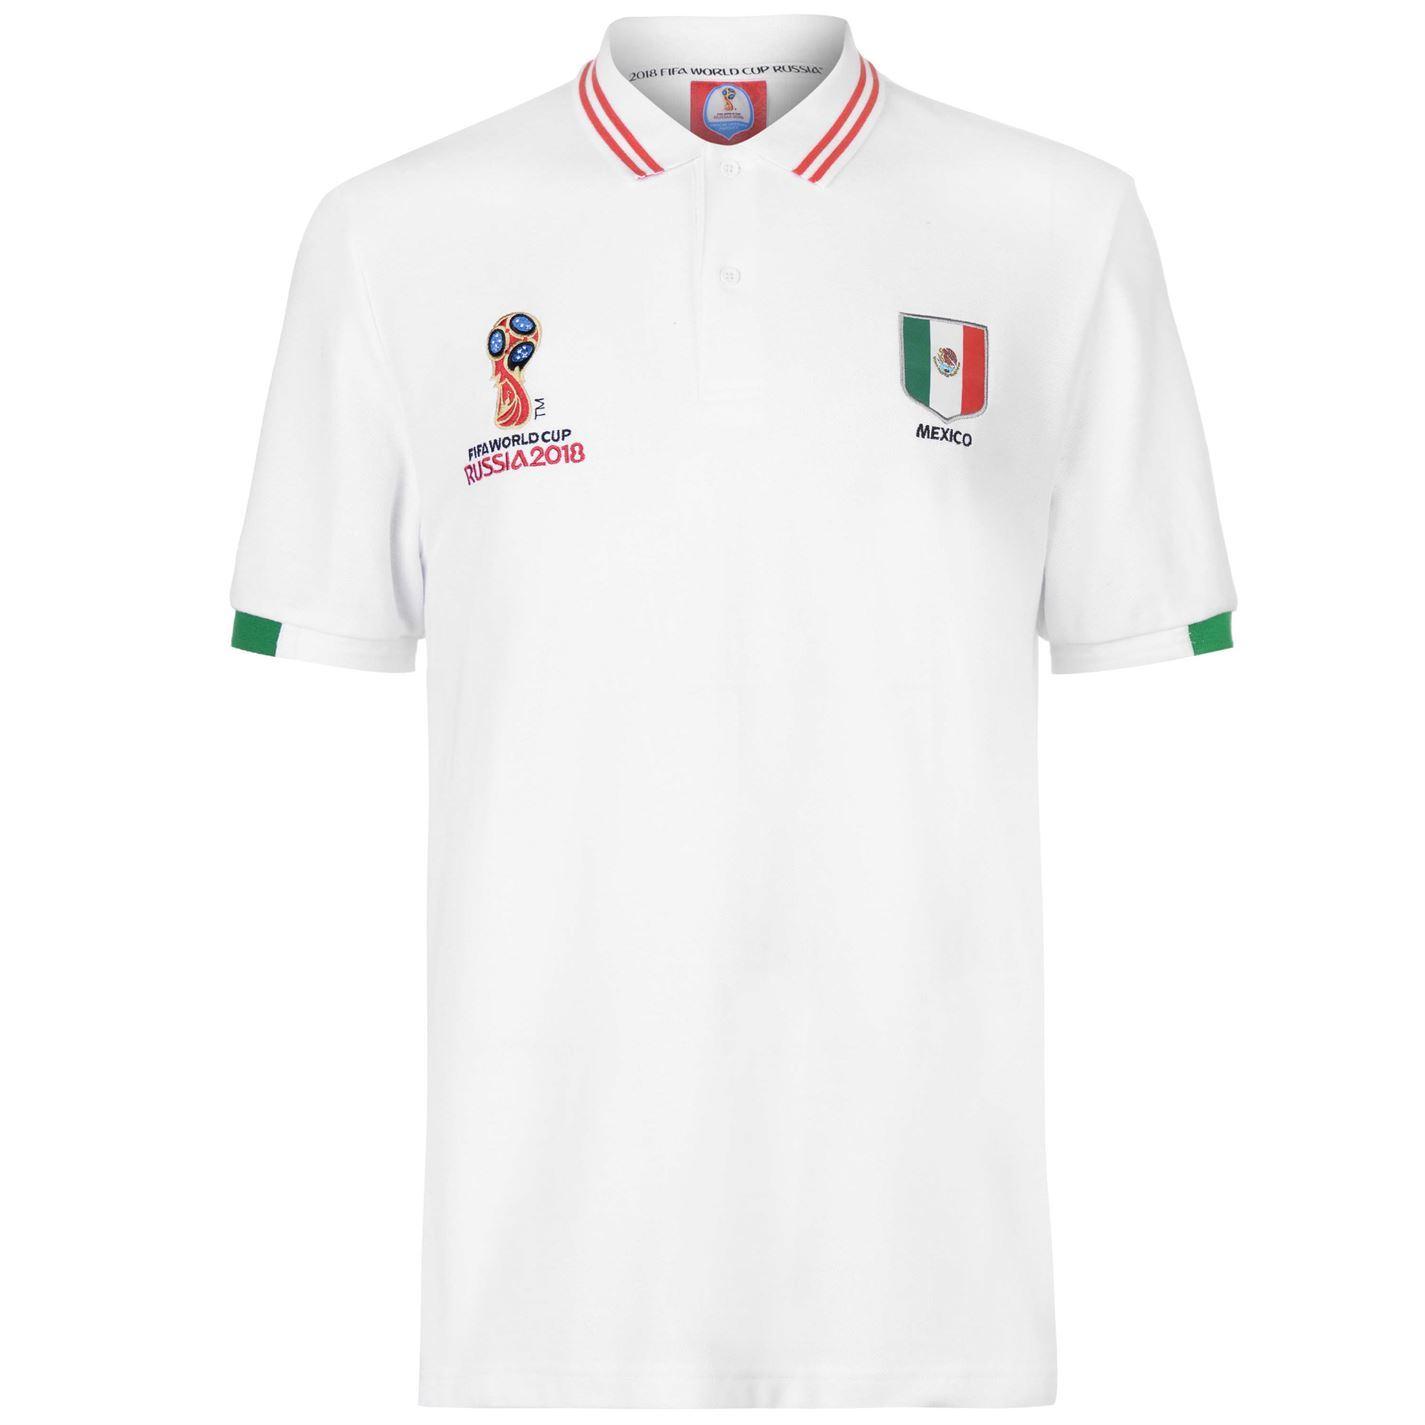 702dd7830 ... FIFA World Cup 2018 Mexico Polo Shirt Mens White Football Soccer Top T- Shirt ...